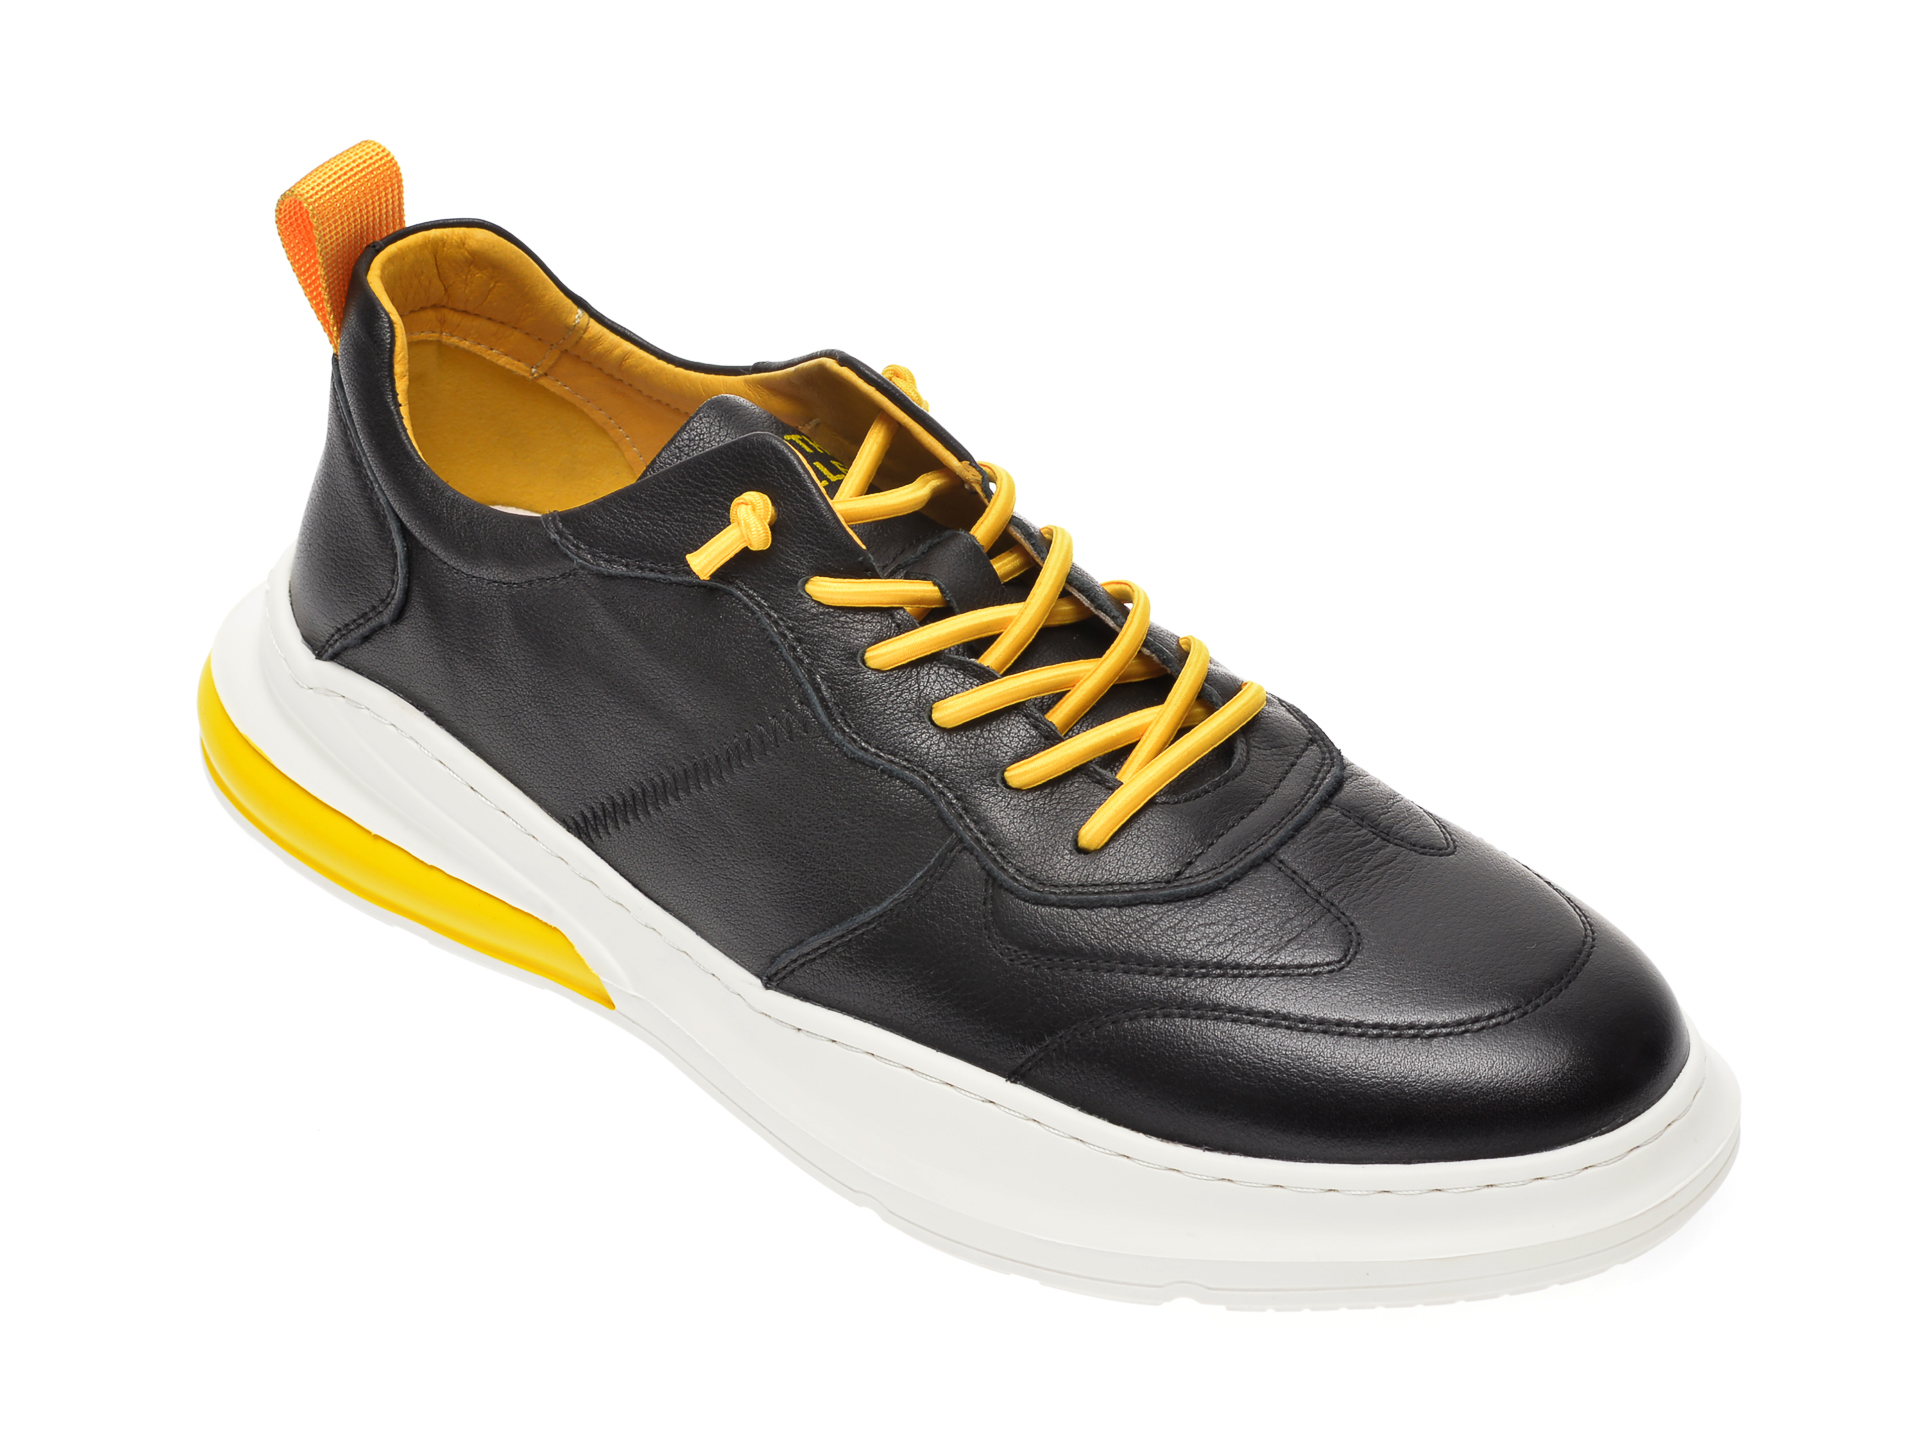 Pantofi BITE THE BULLET negri, 9316055, din piele naturala